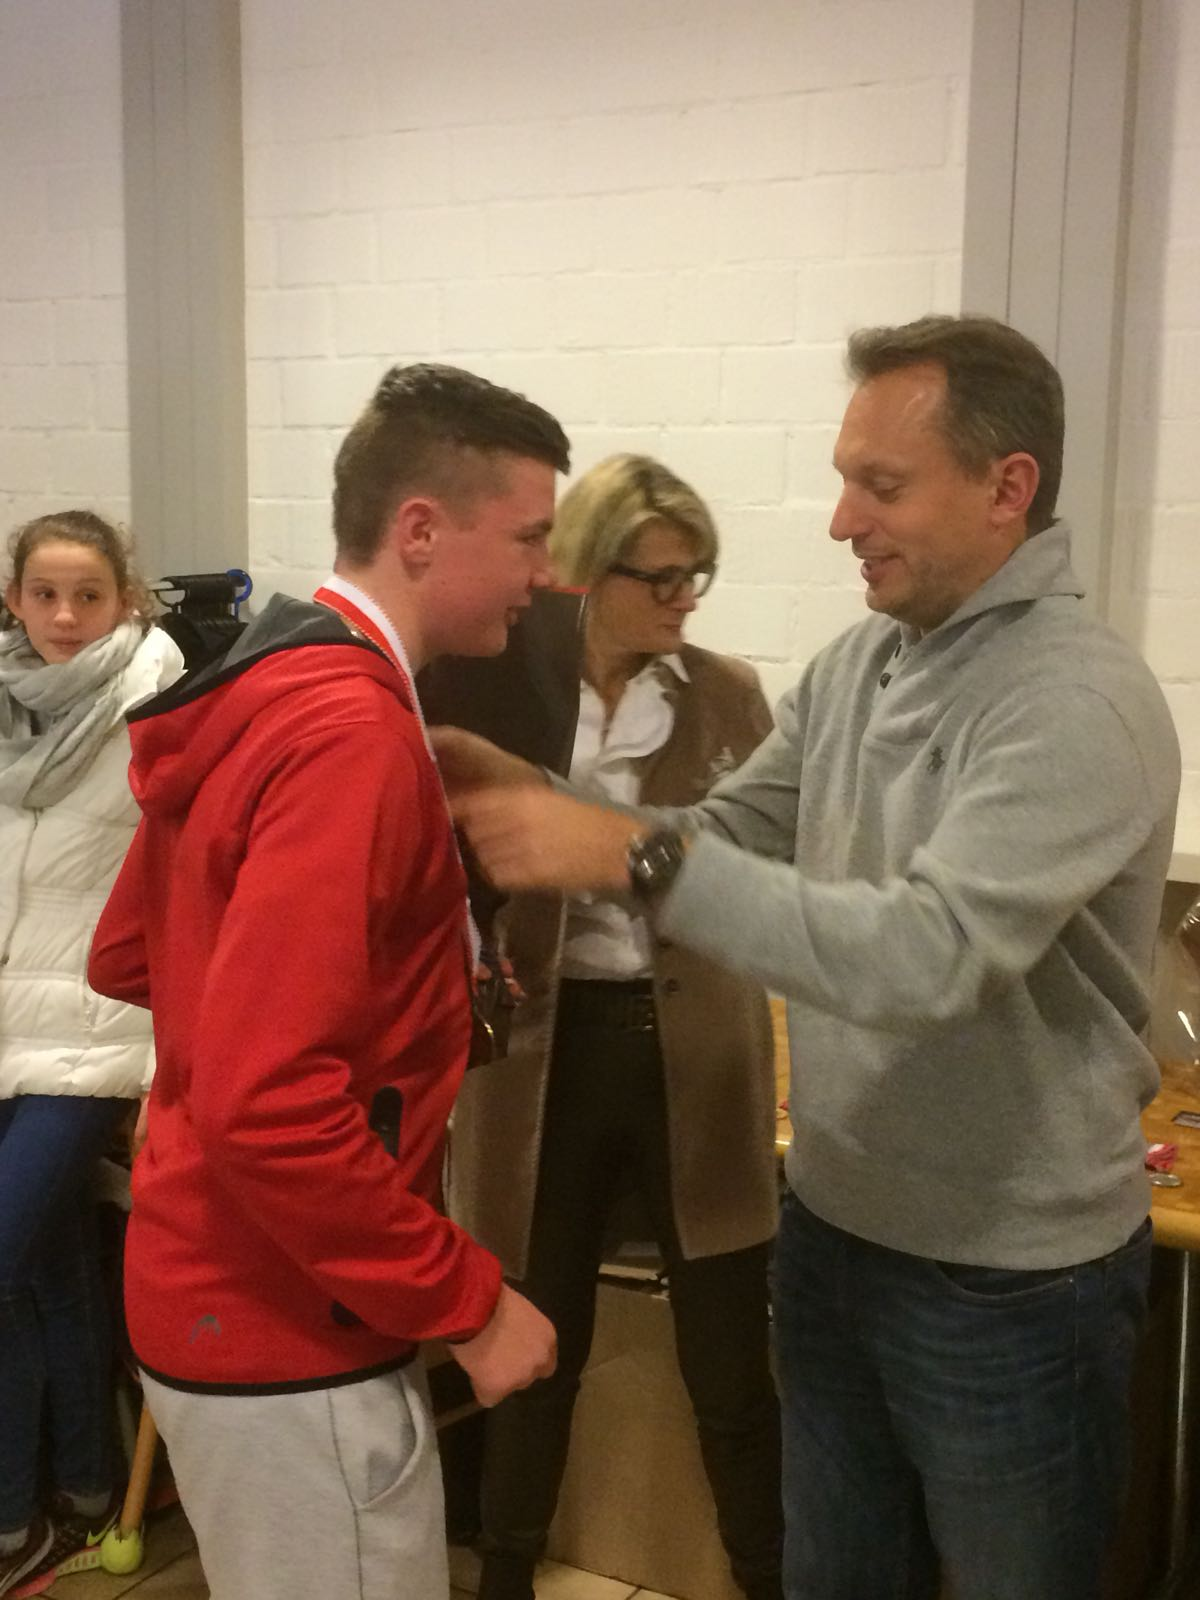 Yves Allegro übergibt Dominic die Medaille